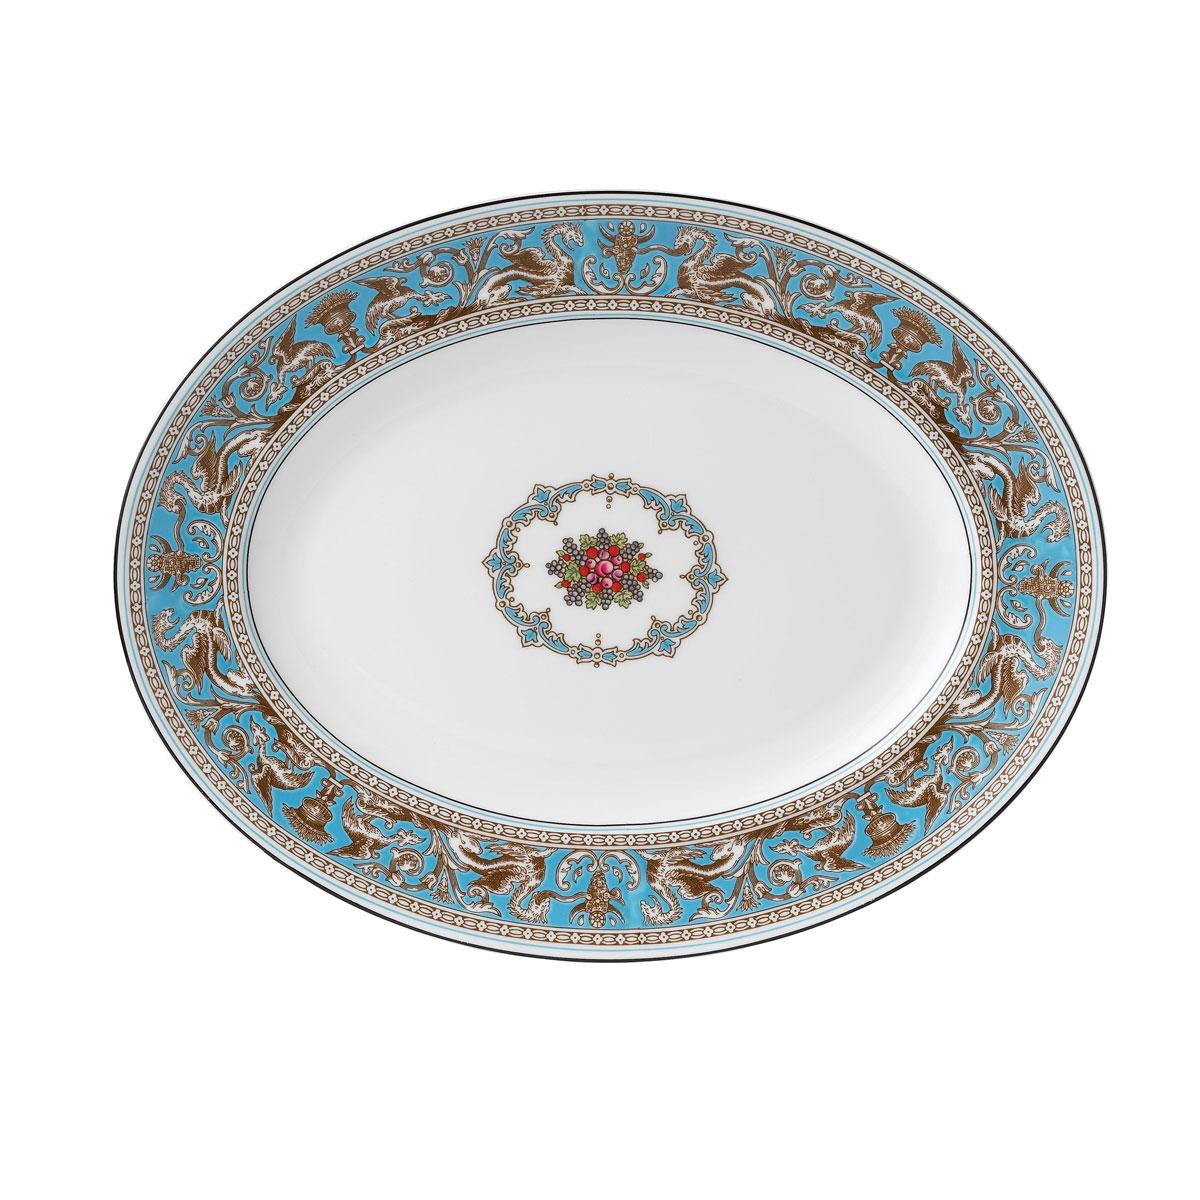 "Wedgwood Florentine Turquoise Oval Platter 13.75"""